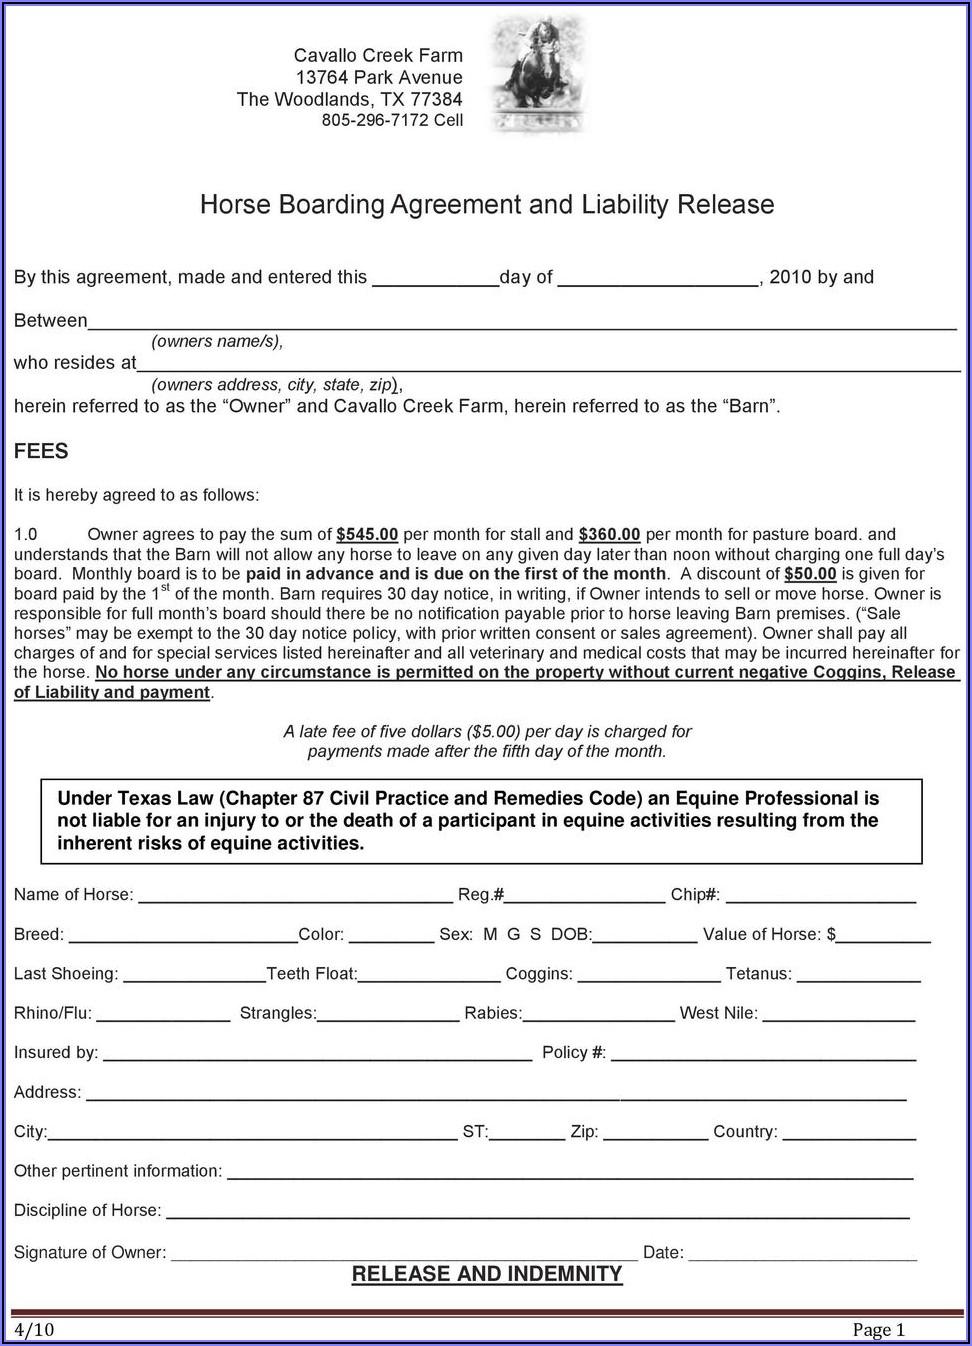 Arizona Equine Liability Release Form